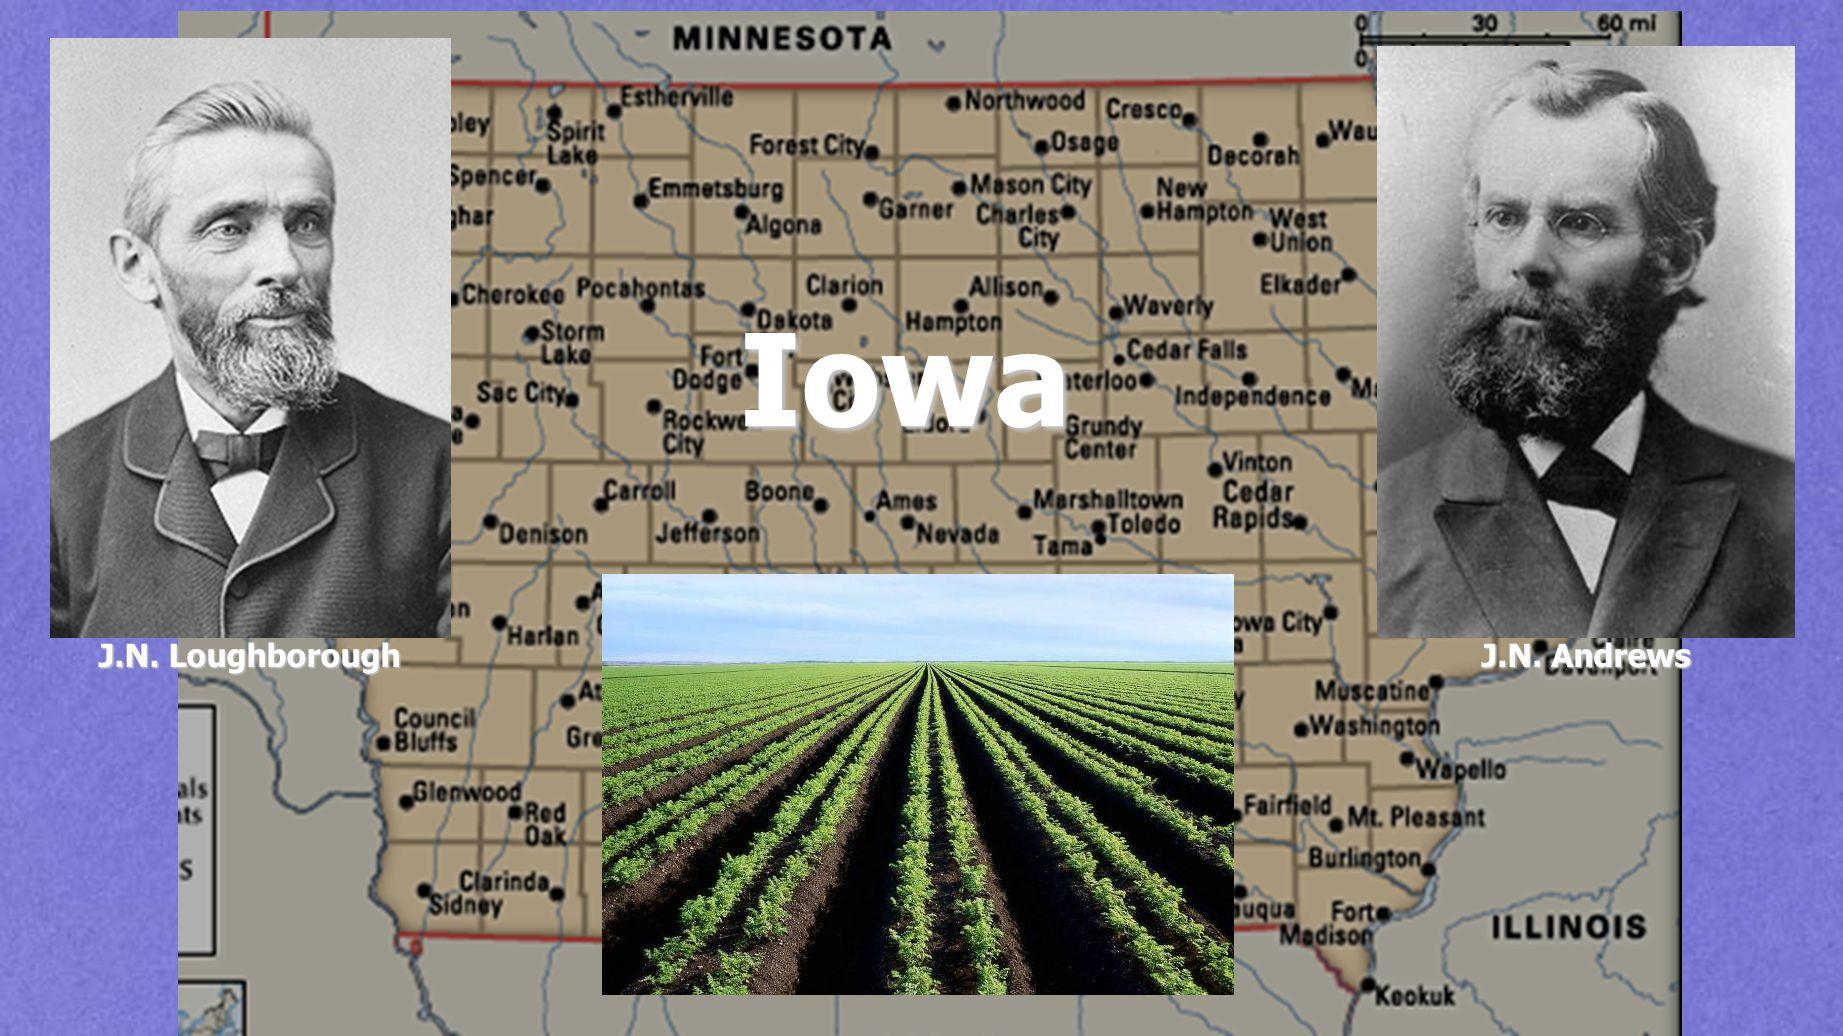 J.N. Loughborough J.N. Andrews Iowa